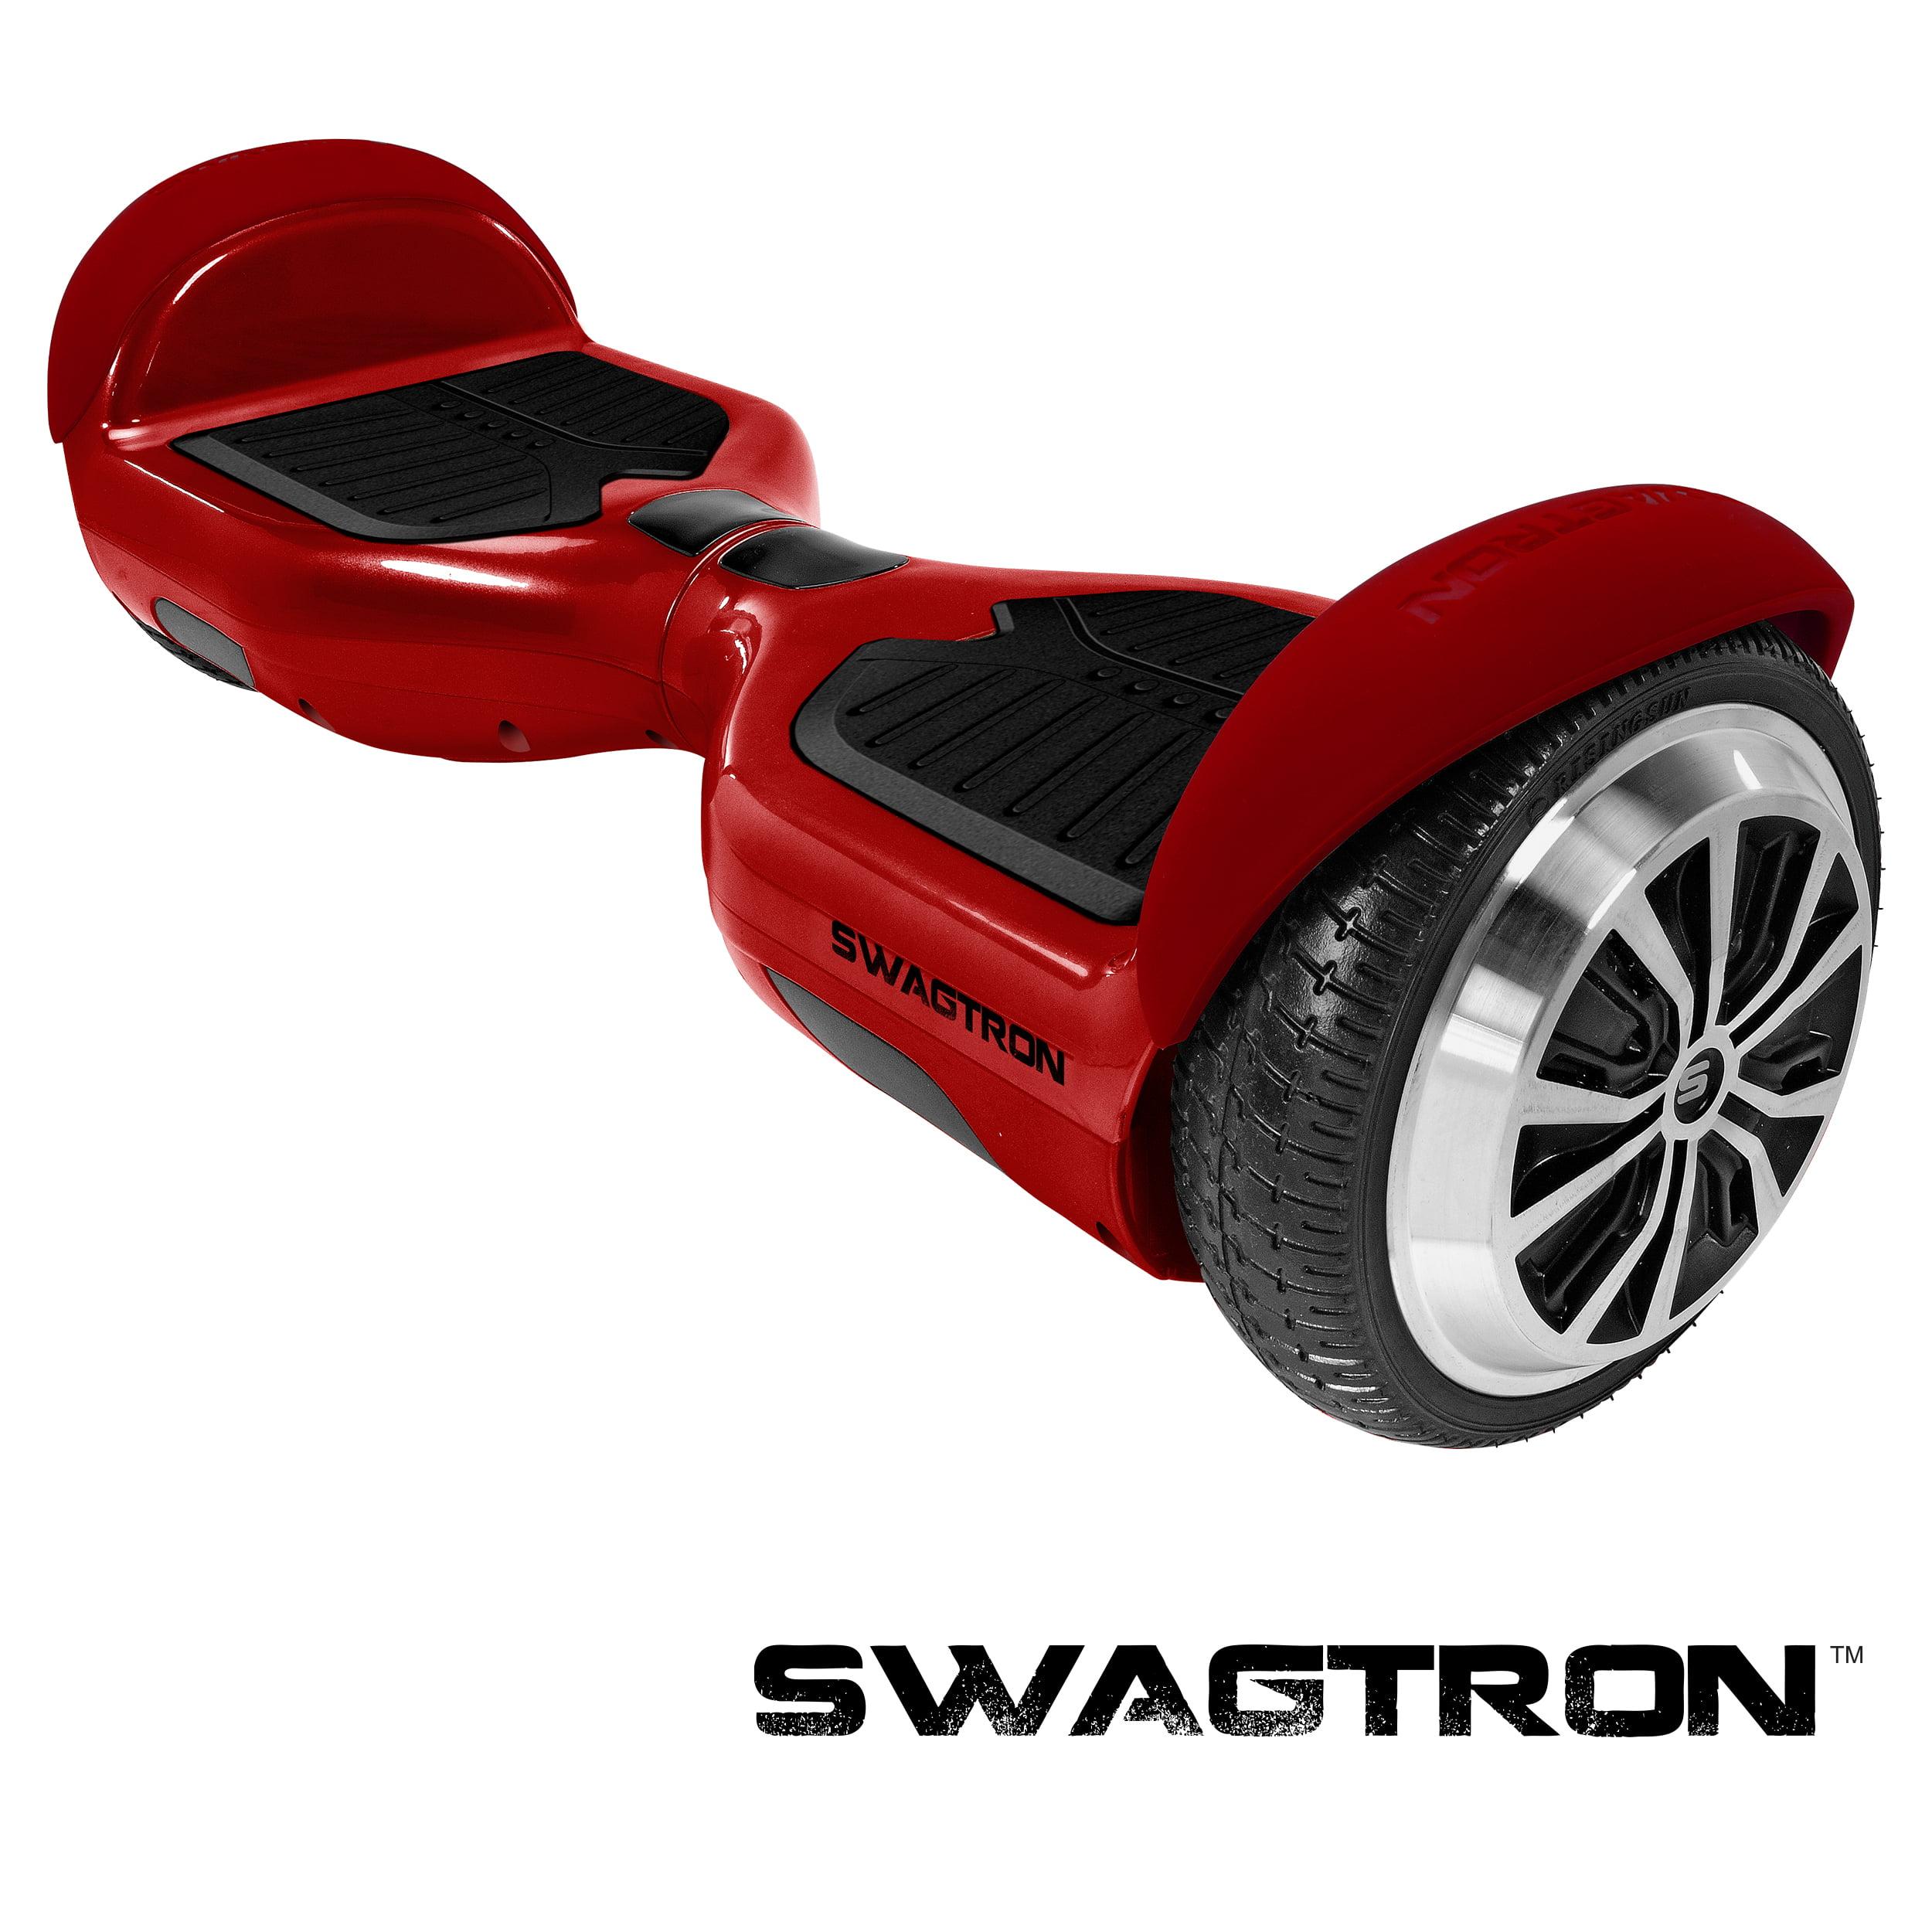 SWAGTRON 88570-6 T1 GARNET Swagtron T1 Hoverboard (Garnet...